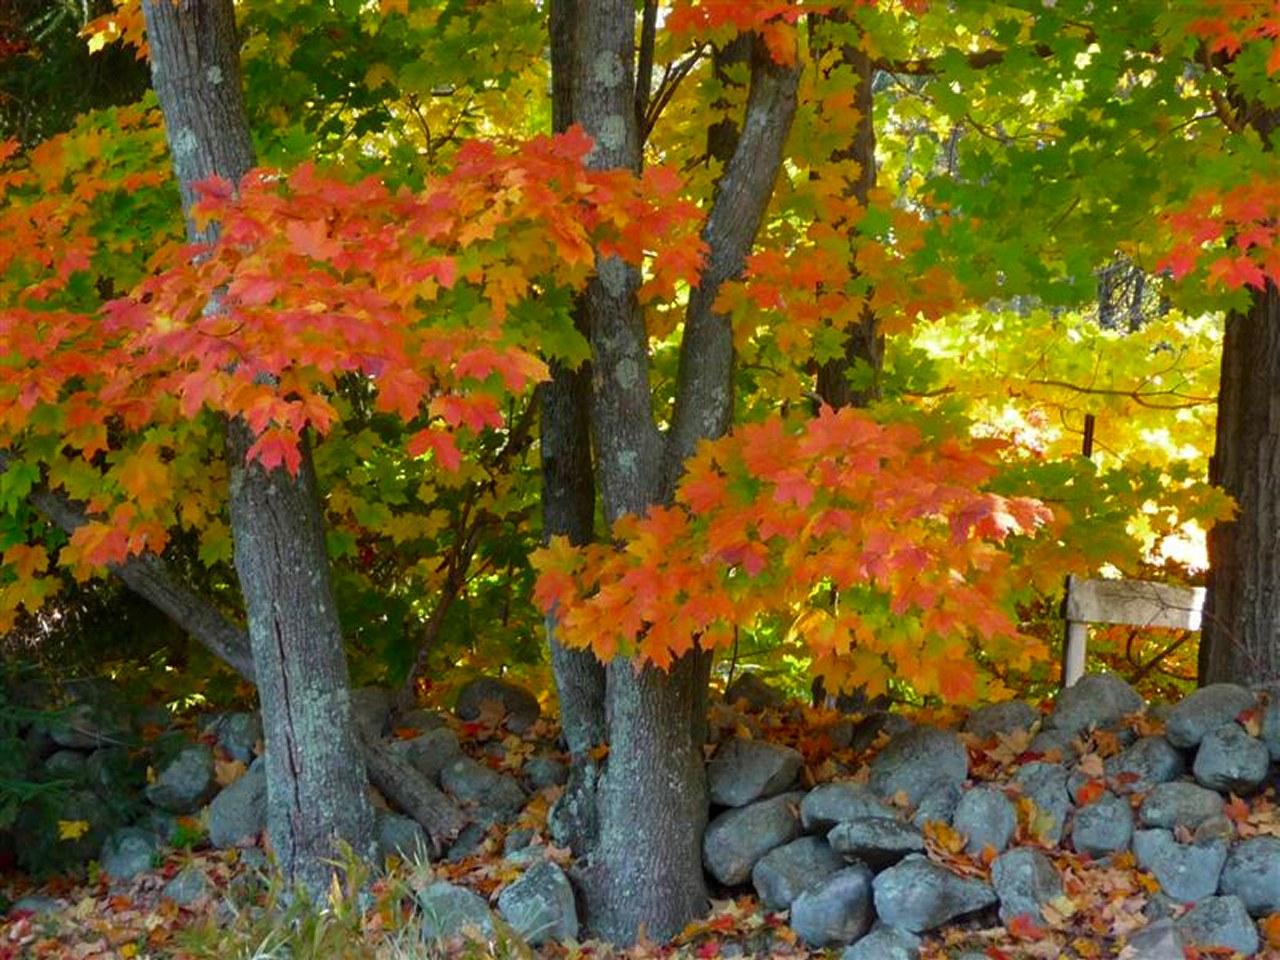 Cloudeight free desktop wallpaper - Pics of fall scenes ...